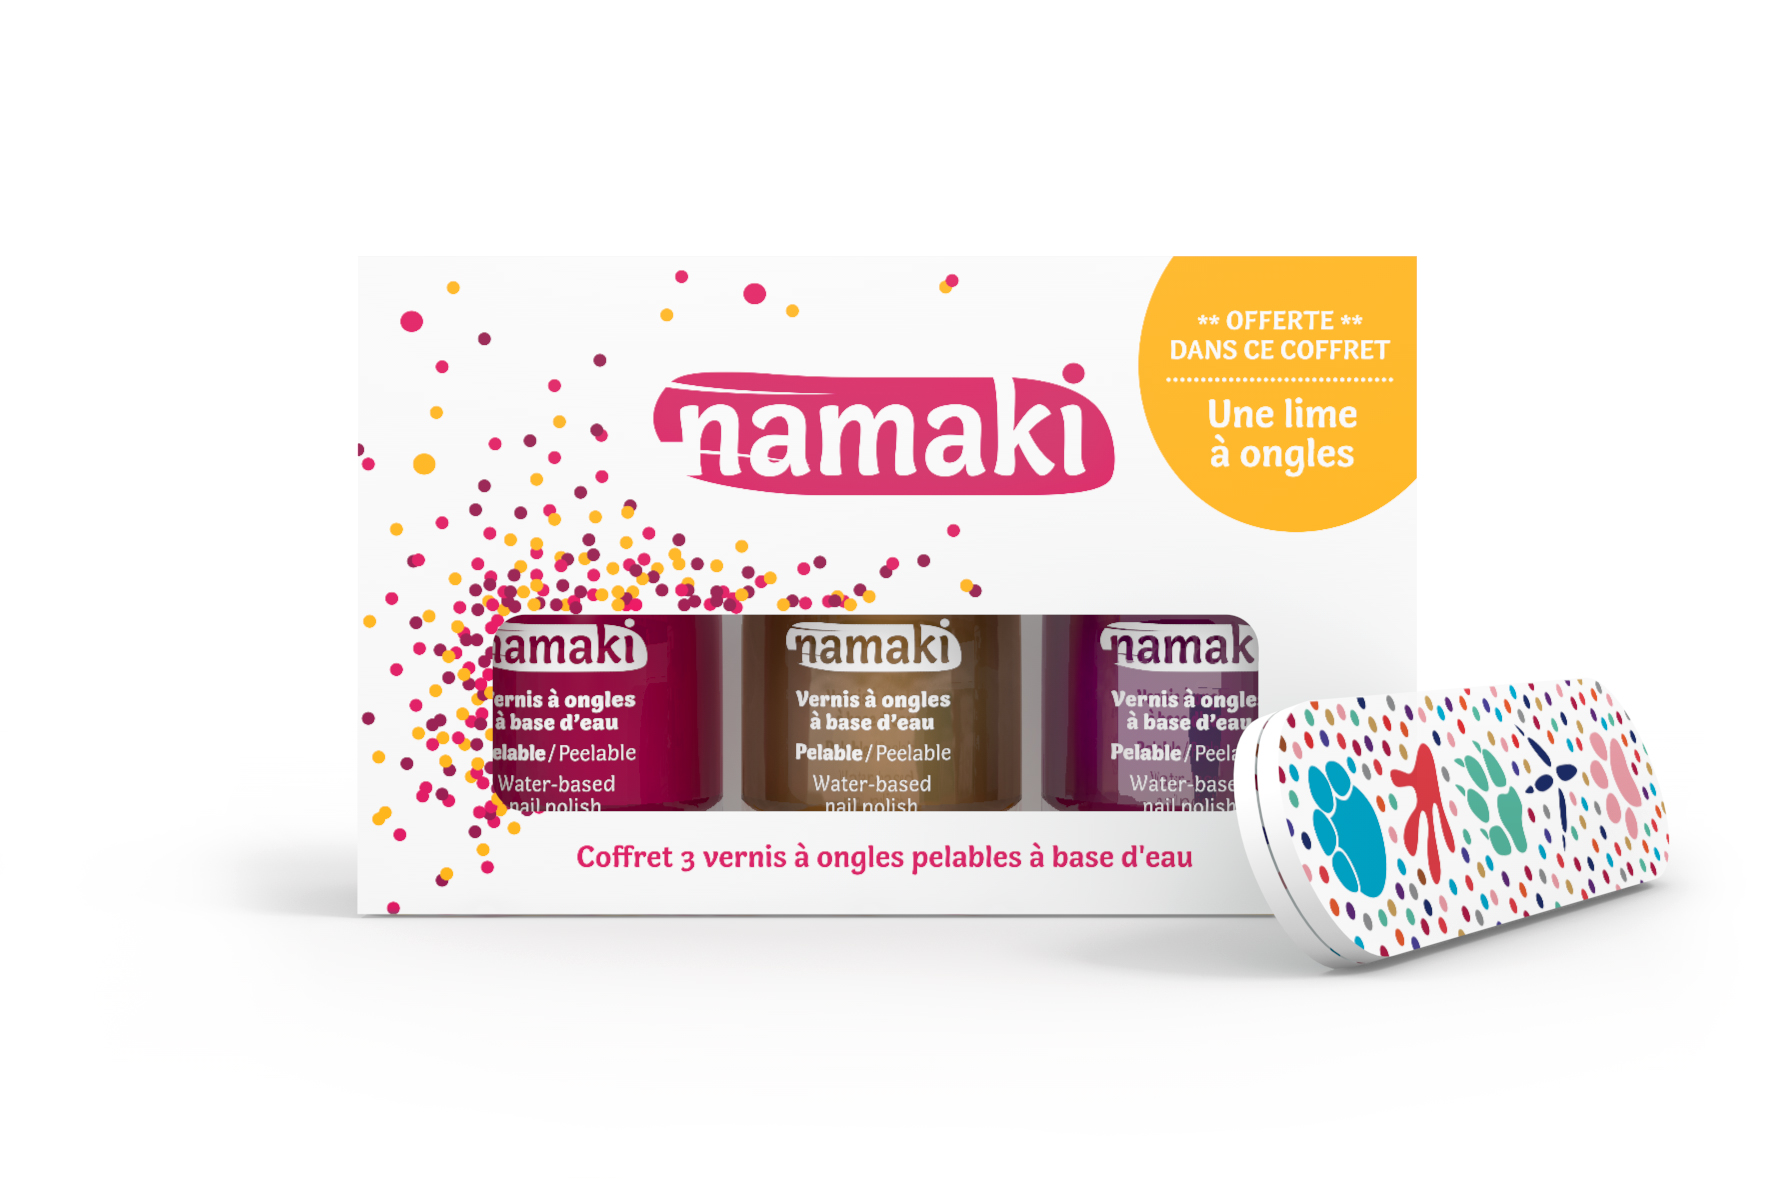 namaki sur Doux Good - Coffret 3 vernis Namaki Framboise-Or-Fuchsia-et lime à ongles offerte